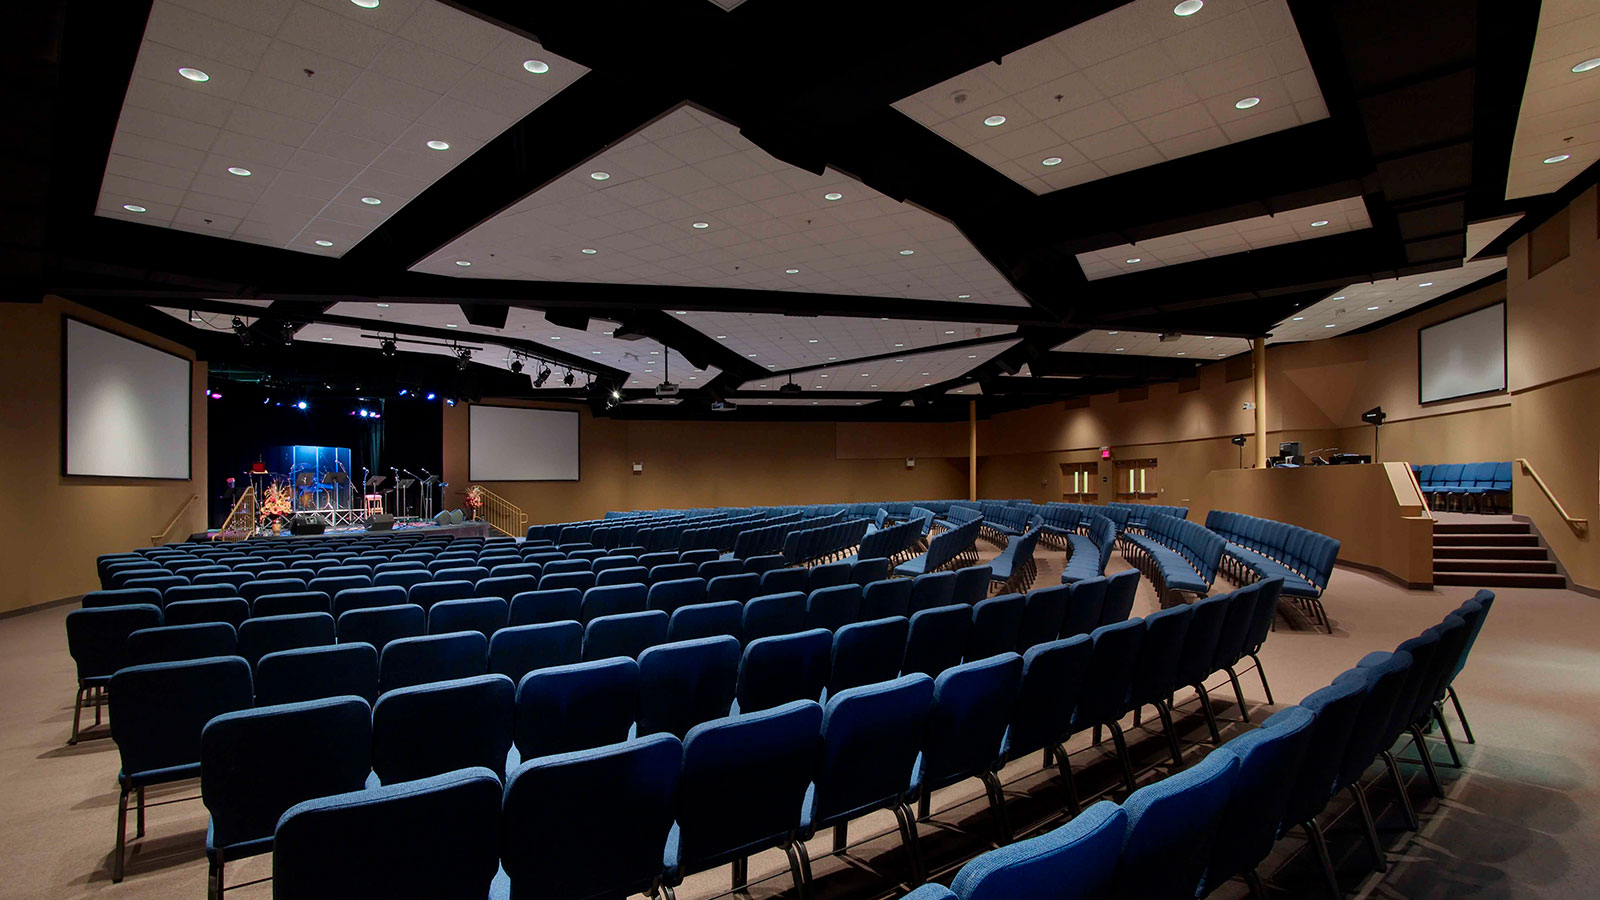 Grace-Fellowship-Church---Phase-1-Auditorium-01.jpg